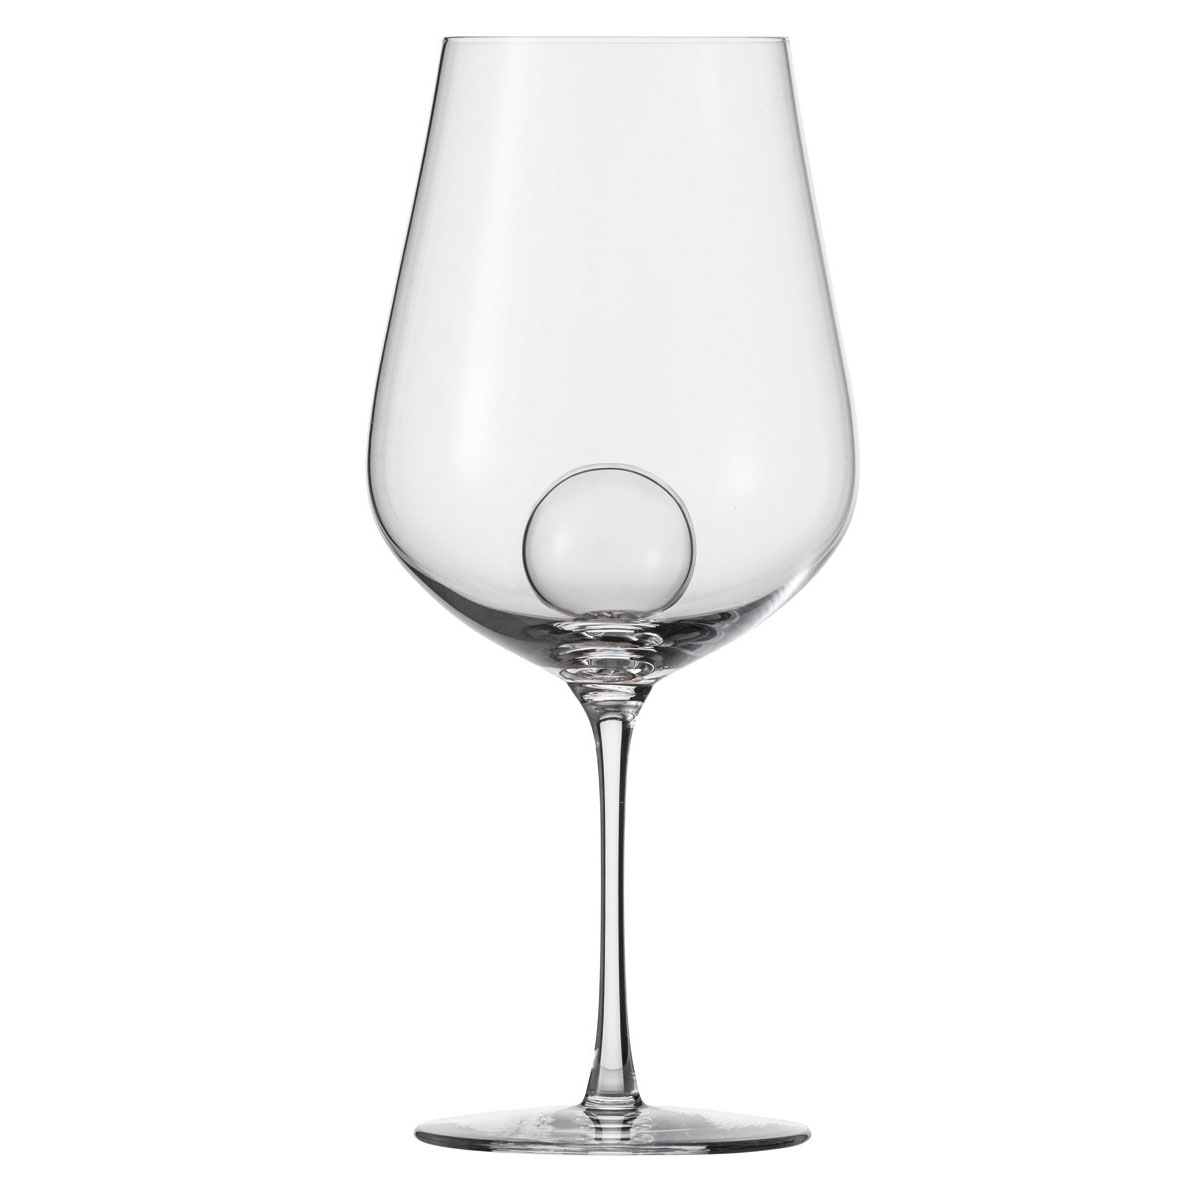 Schott Zwiesel Tritan Crystal, 1872 Air Sense Crystal Red Wine Glass, Single